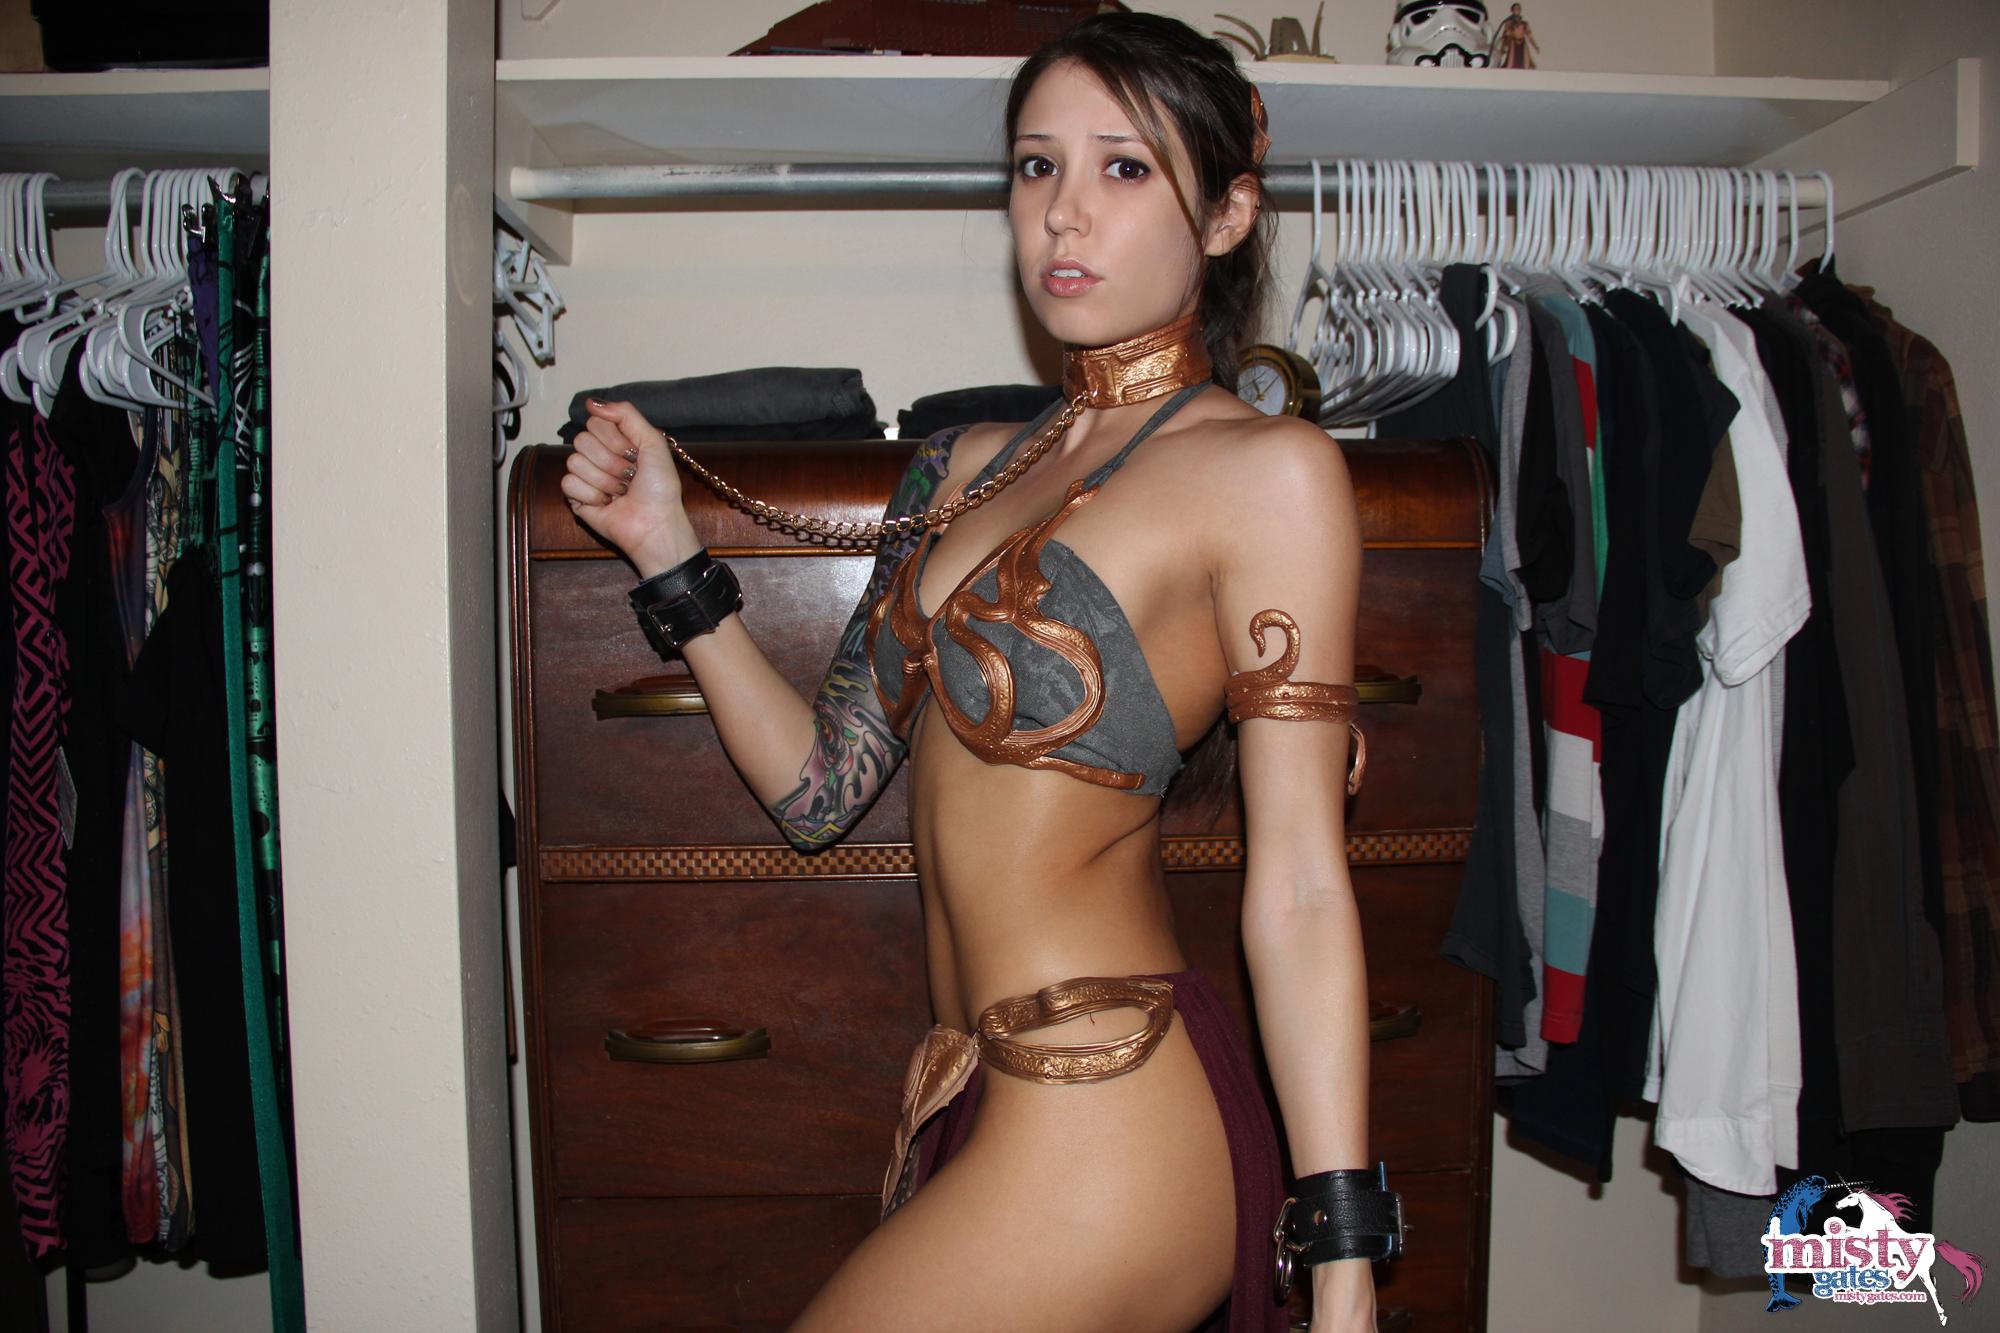 Costume slave porn nude photo